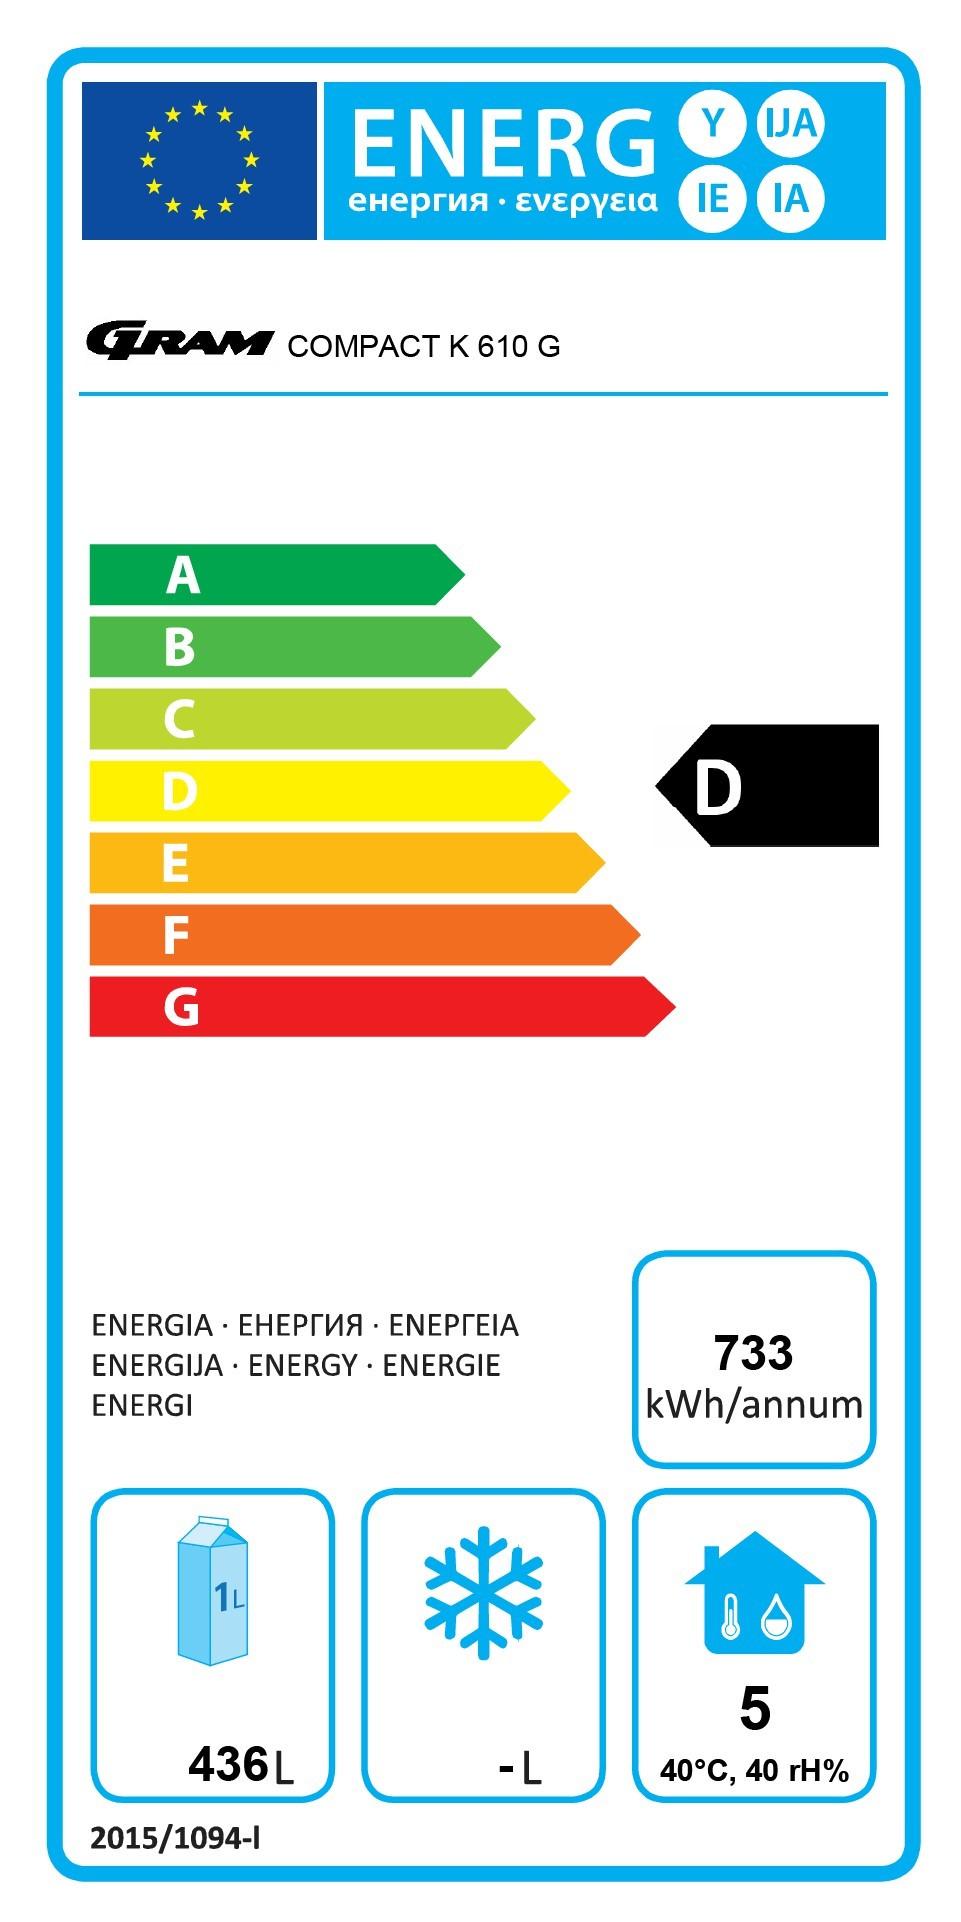 COMPACT KG 610 RG C 4N 583 Ltr Upright Glass Door Display Fridge Energy Rating